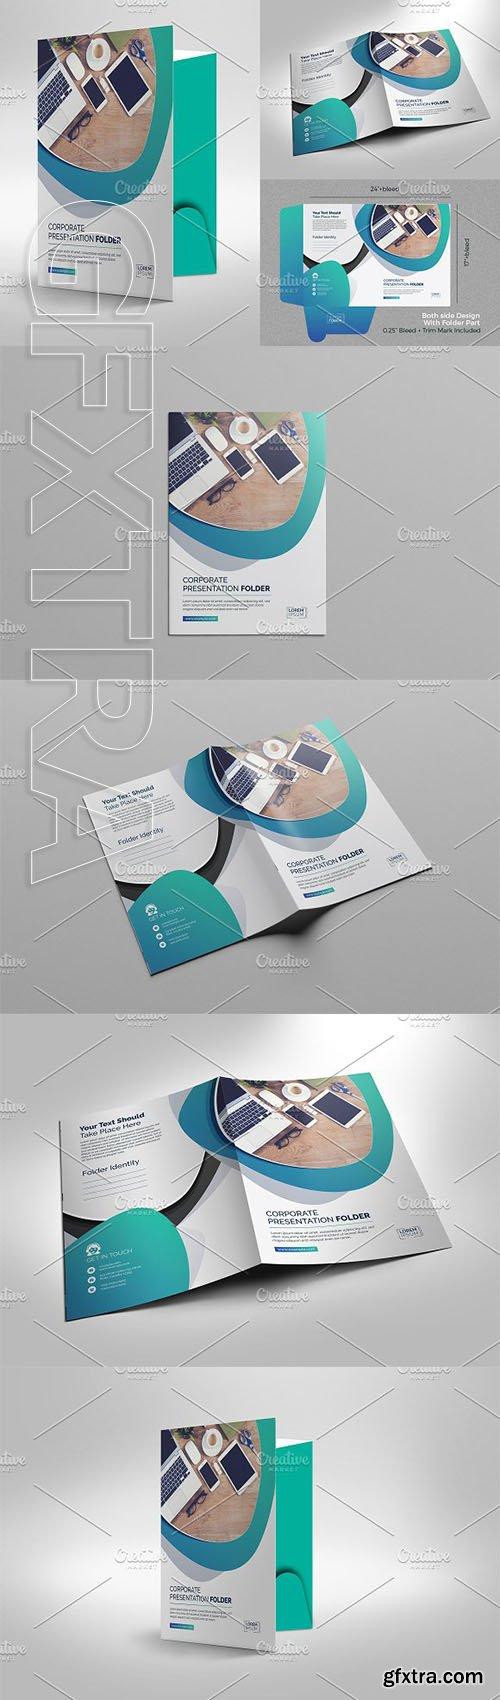 CreativeMarket - Presentation Folder 2981068